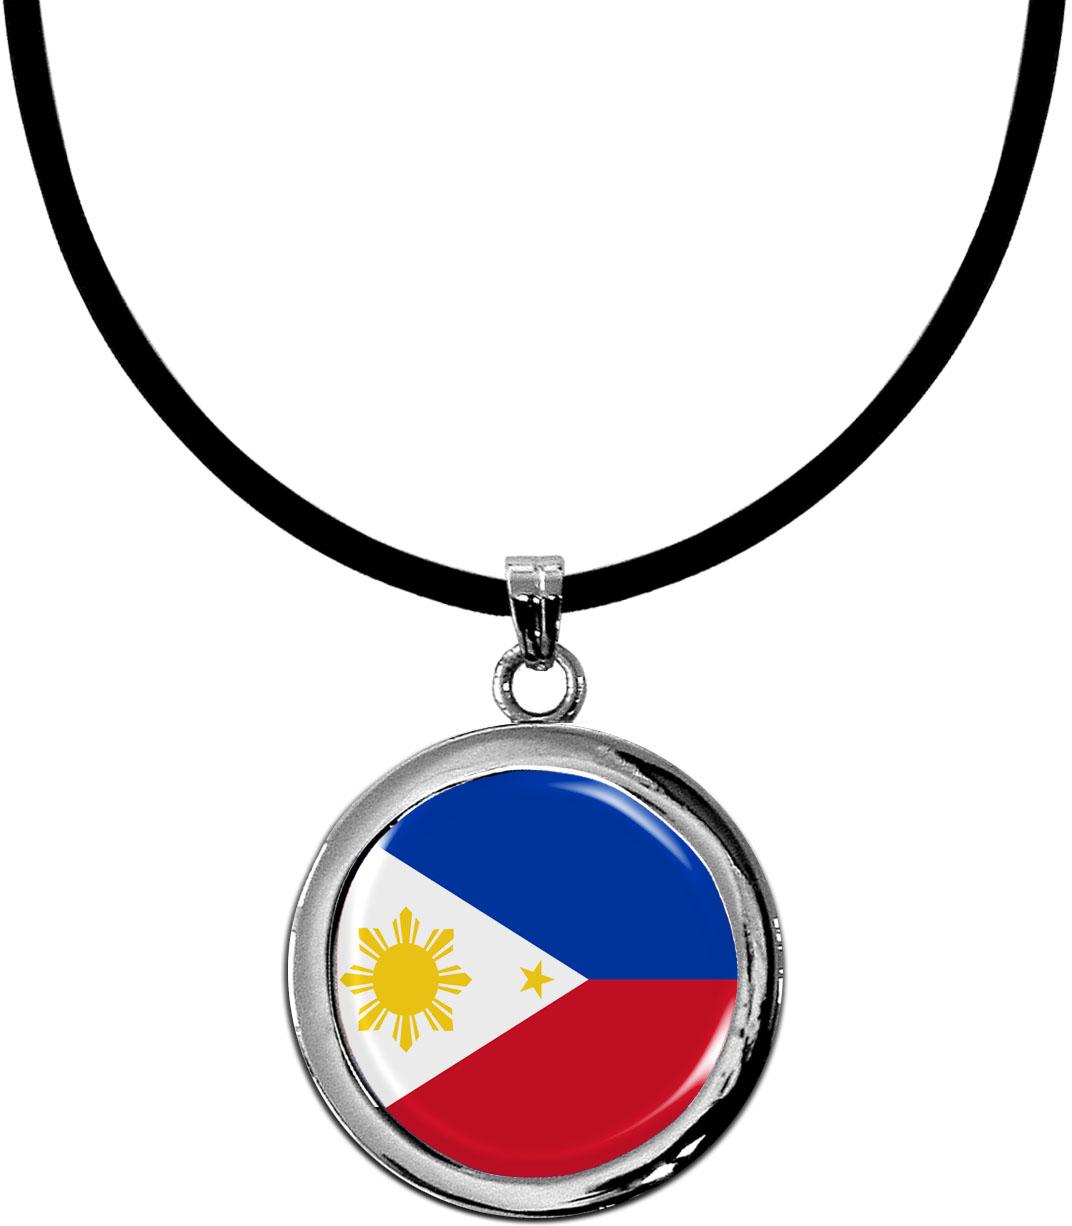 Kettenanhänger / Philippinen / Silikonband mit Silberverschluss